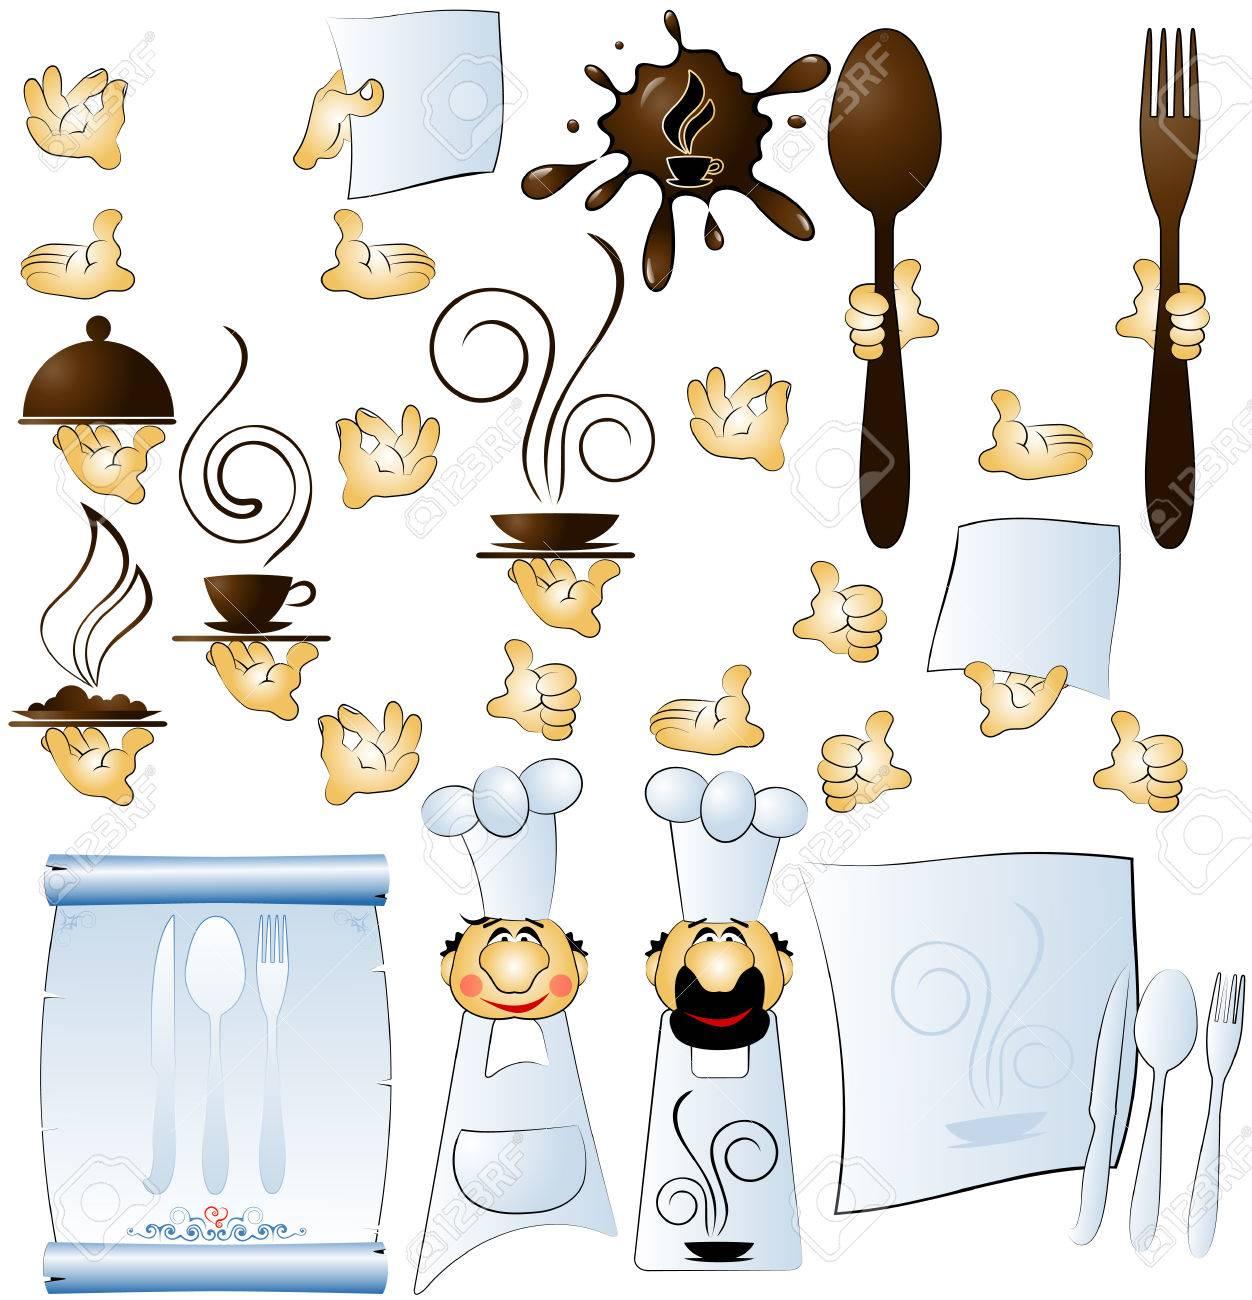 designer cook and hands constituent for restaurant menu Stock Vector - 4658279